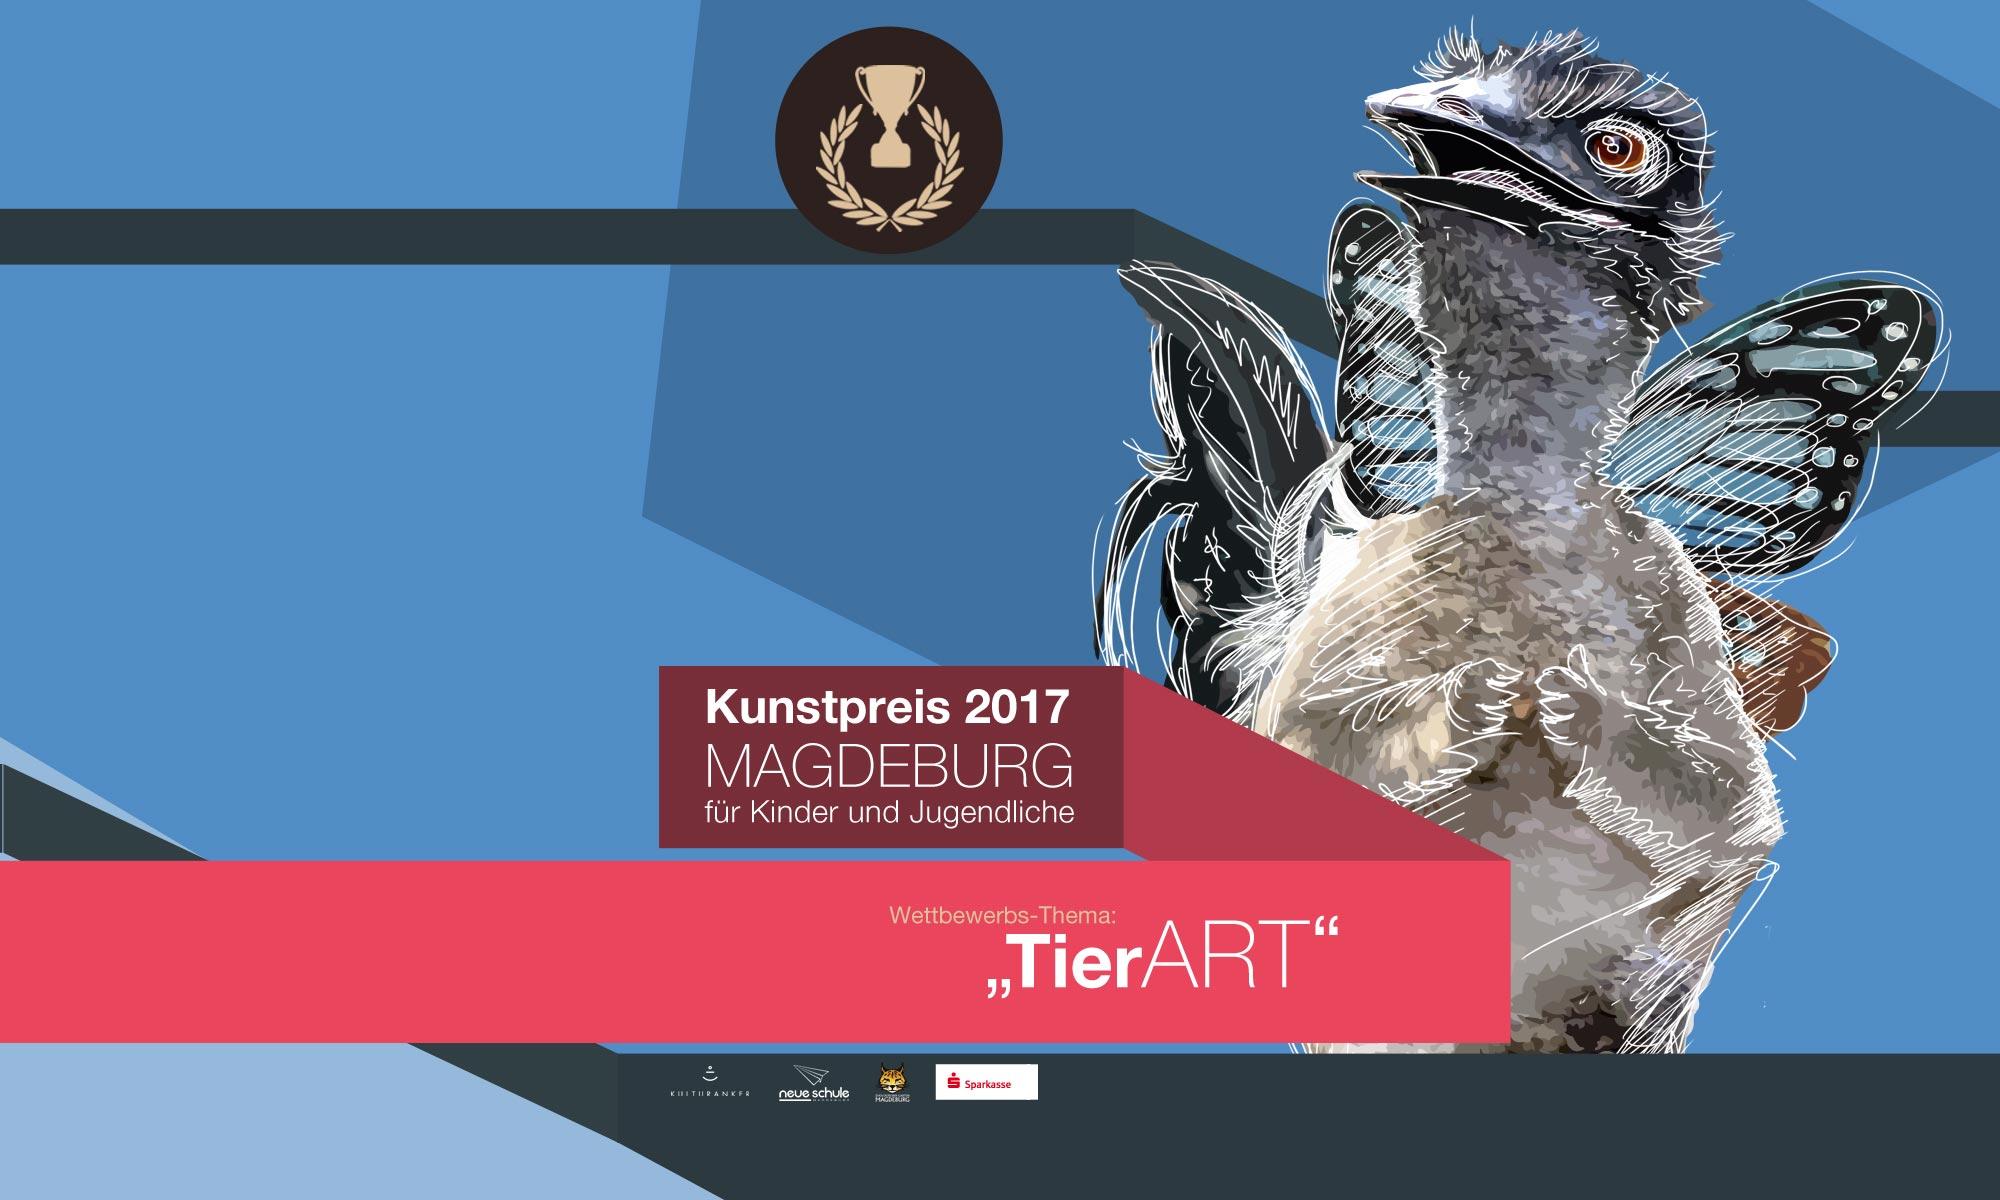 Kunstpreis Magdeburg